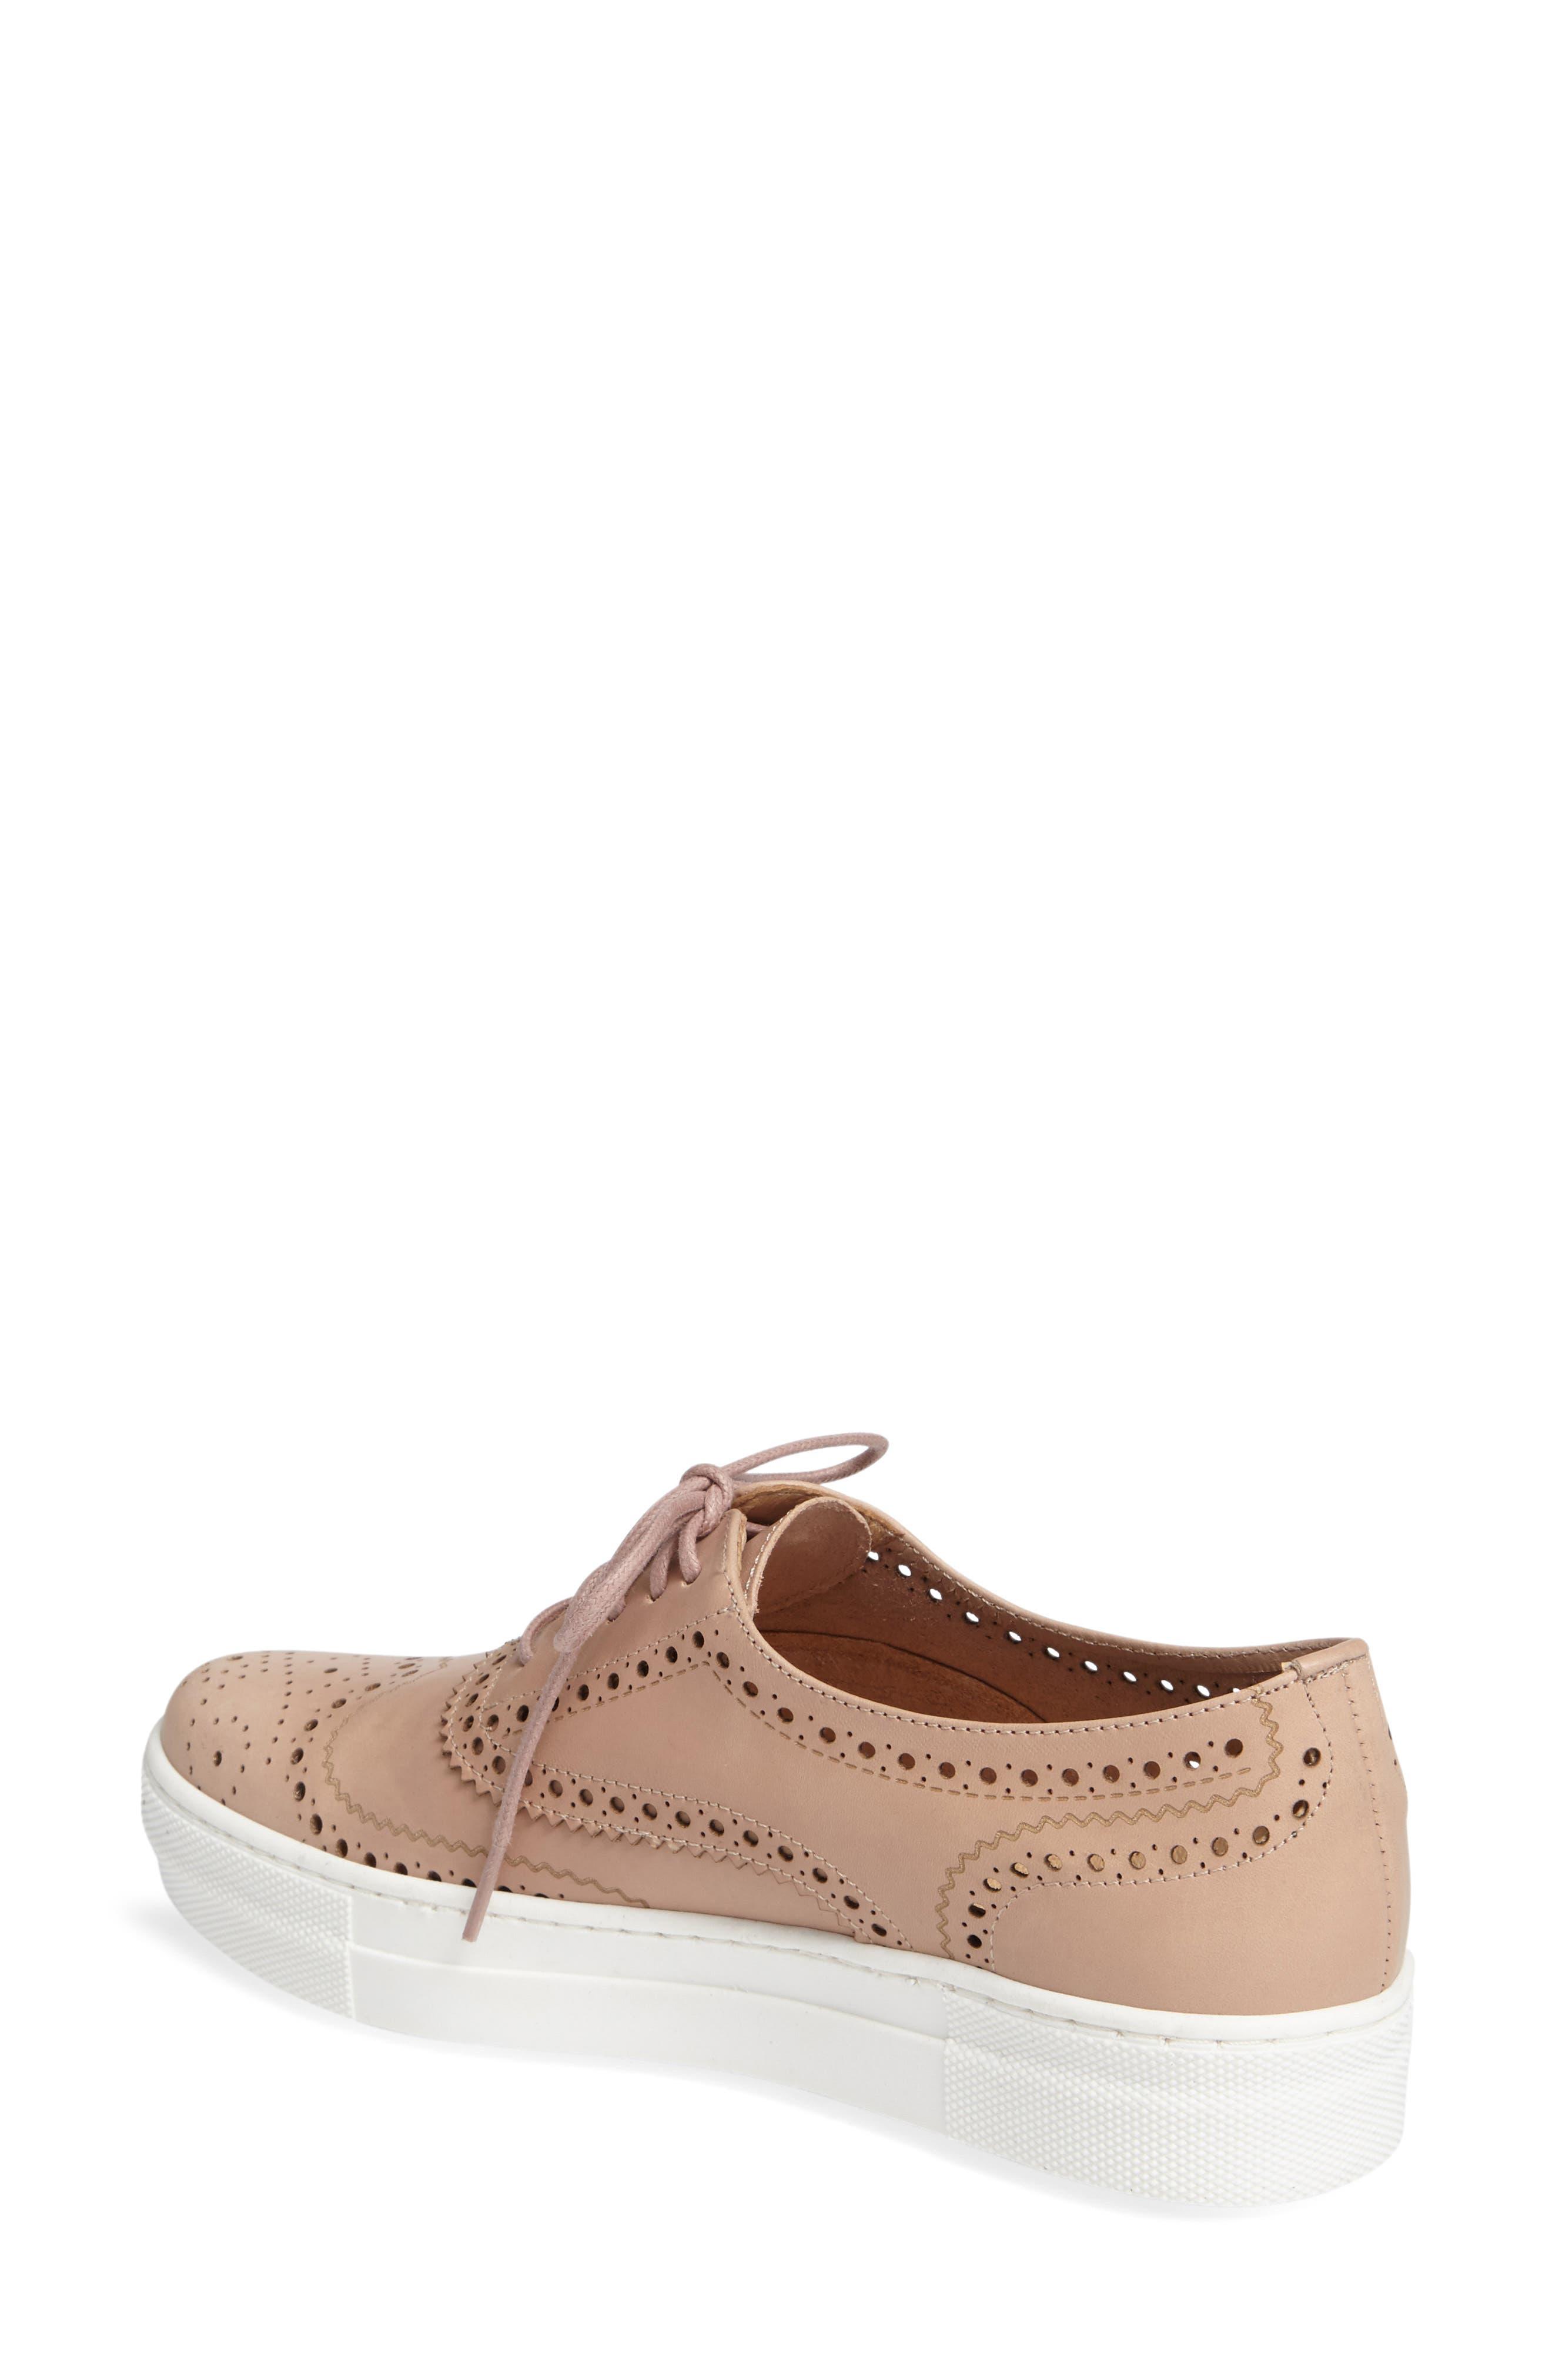 Kimmie Perforated Platform Sneaker,                             Alternate thumbnail 8, color,